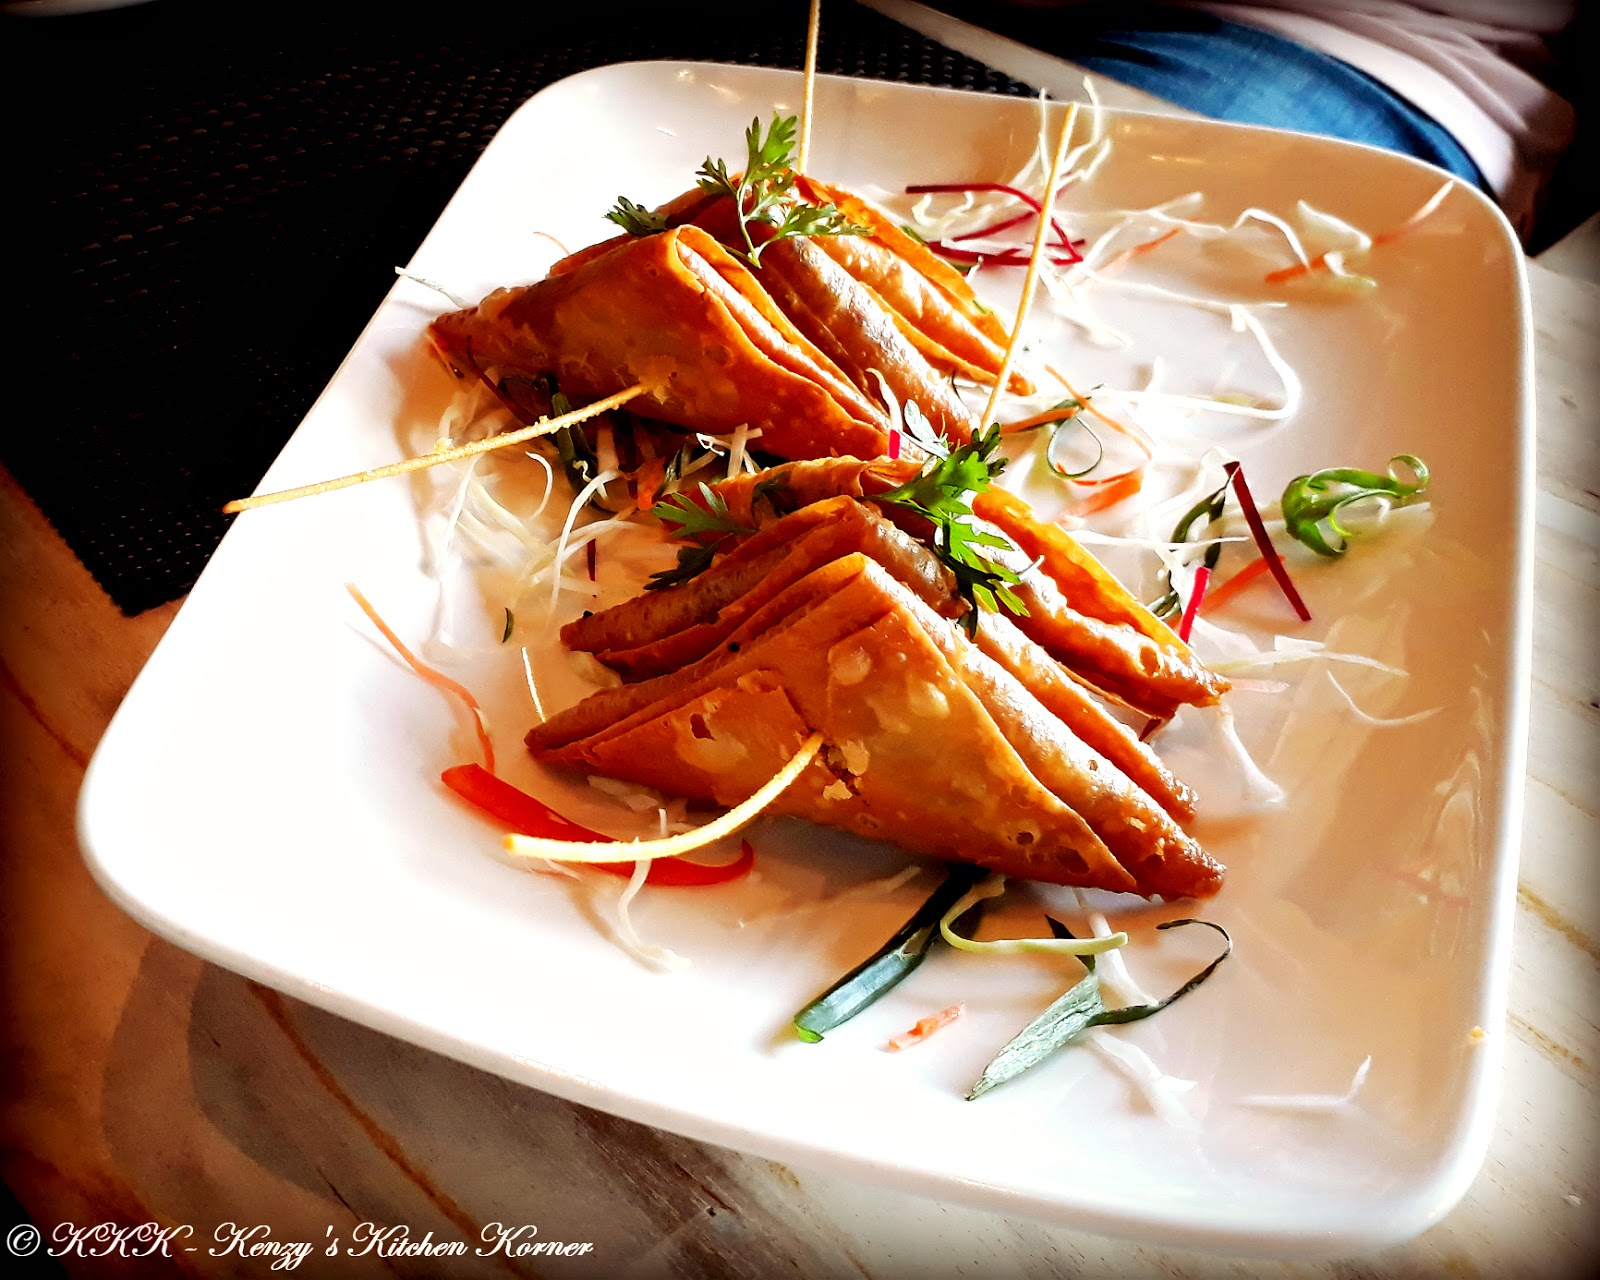 Kenzy s Kitchen Korner Nawab Asia – A Royal Repast